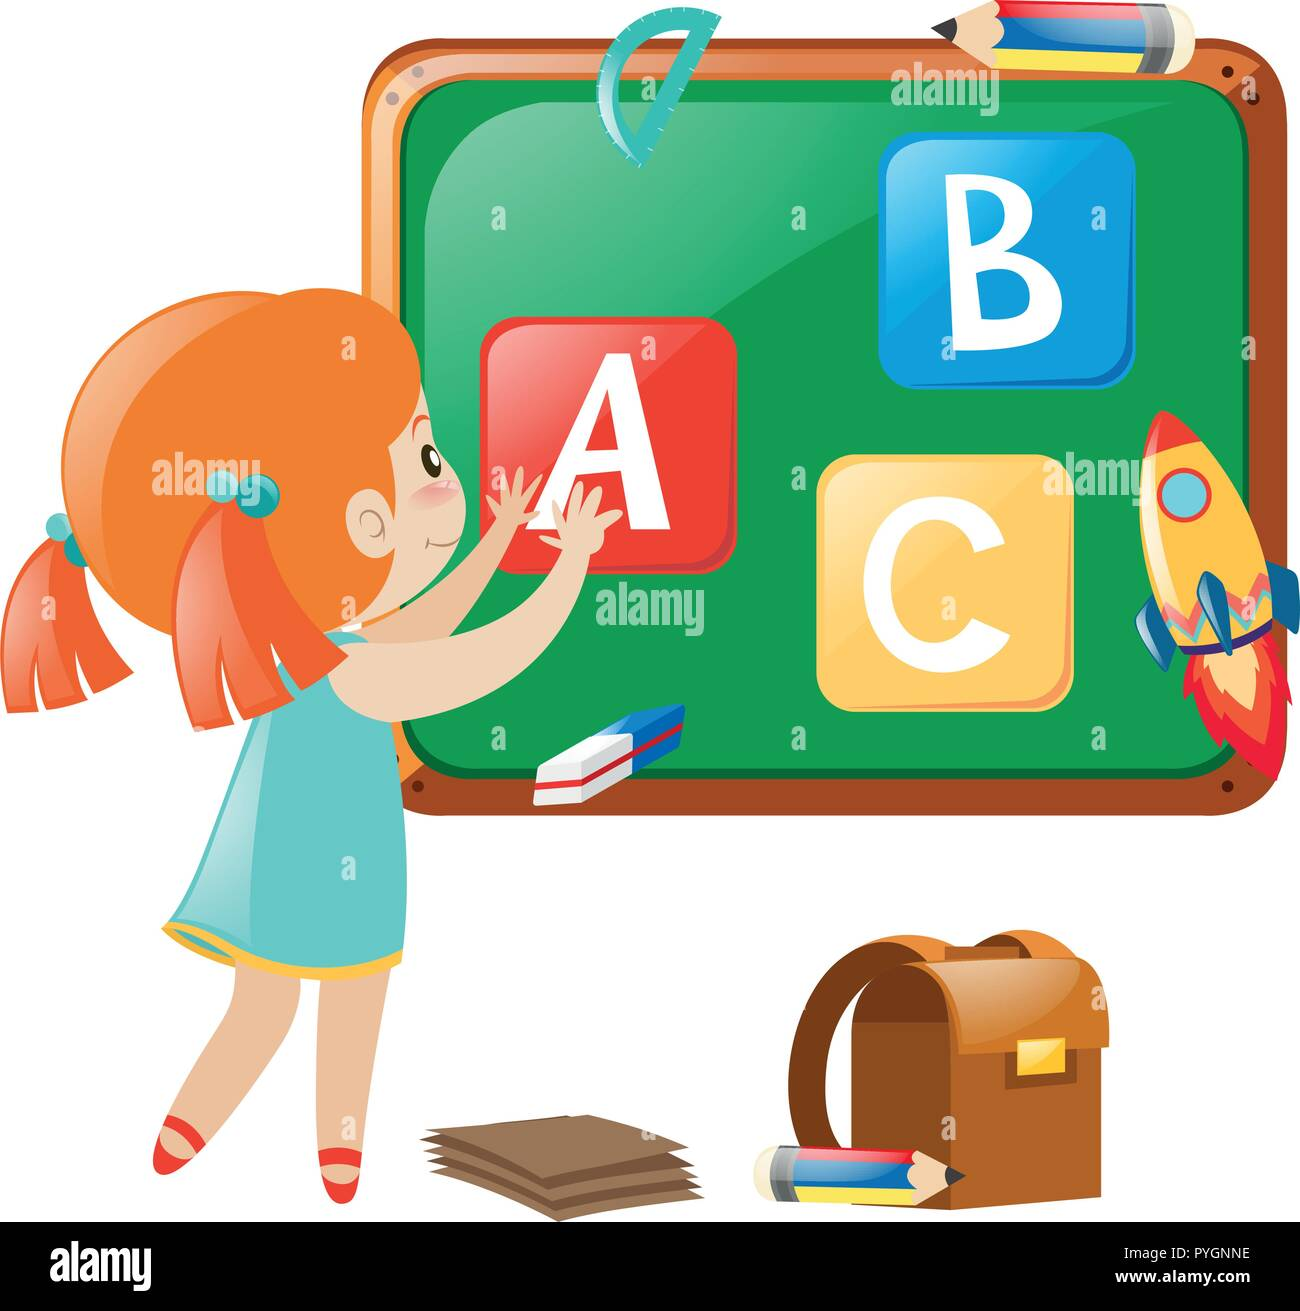 Little girl posting english alphabets on board illustration - Stock Image